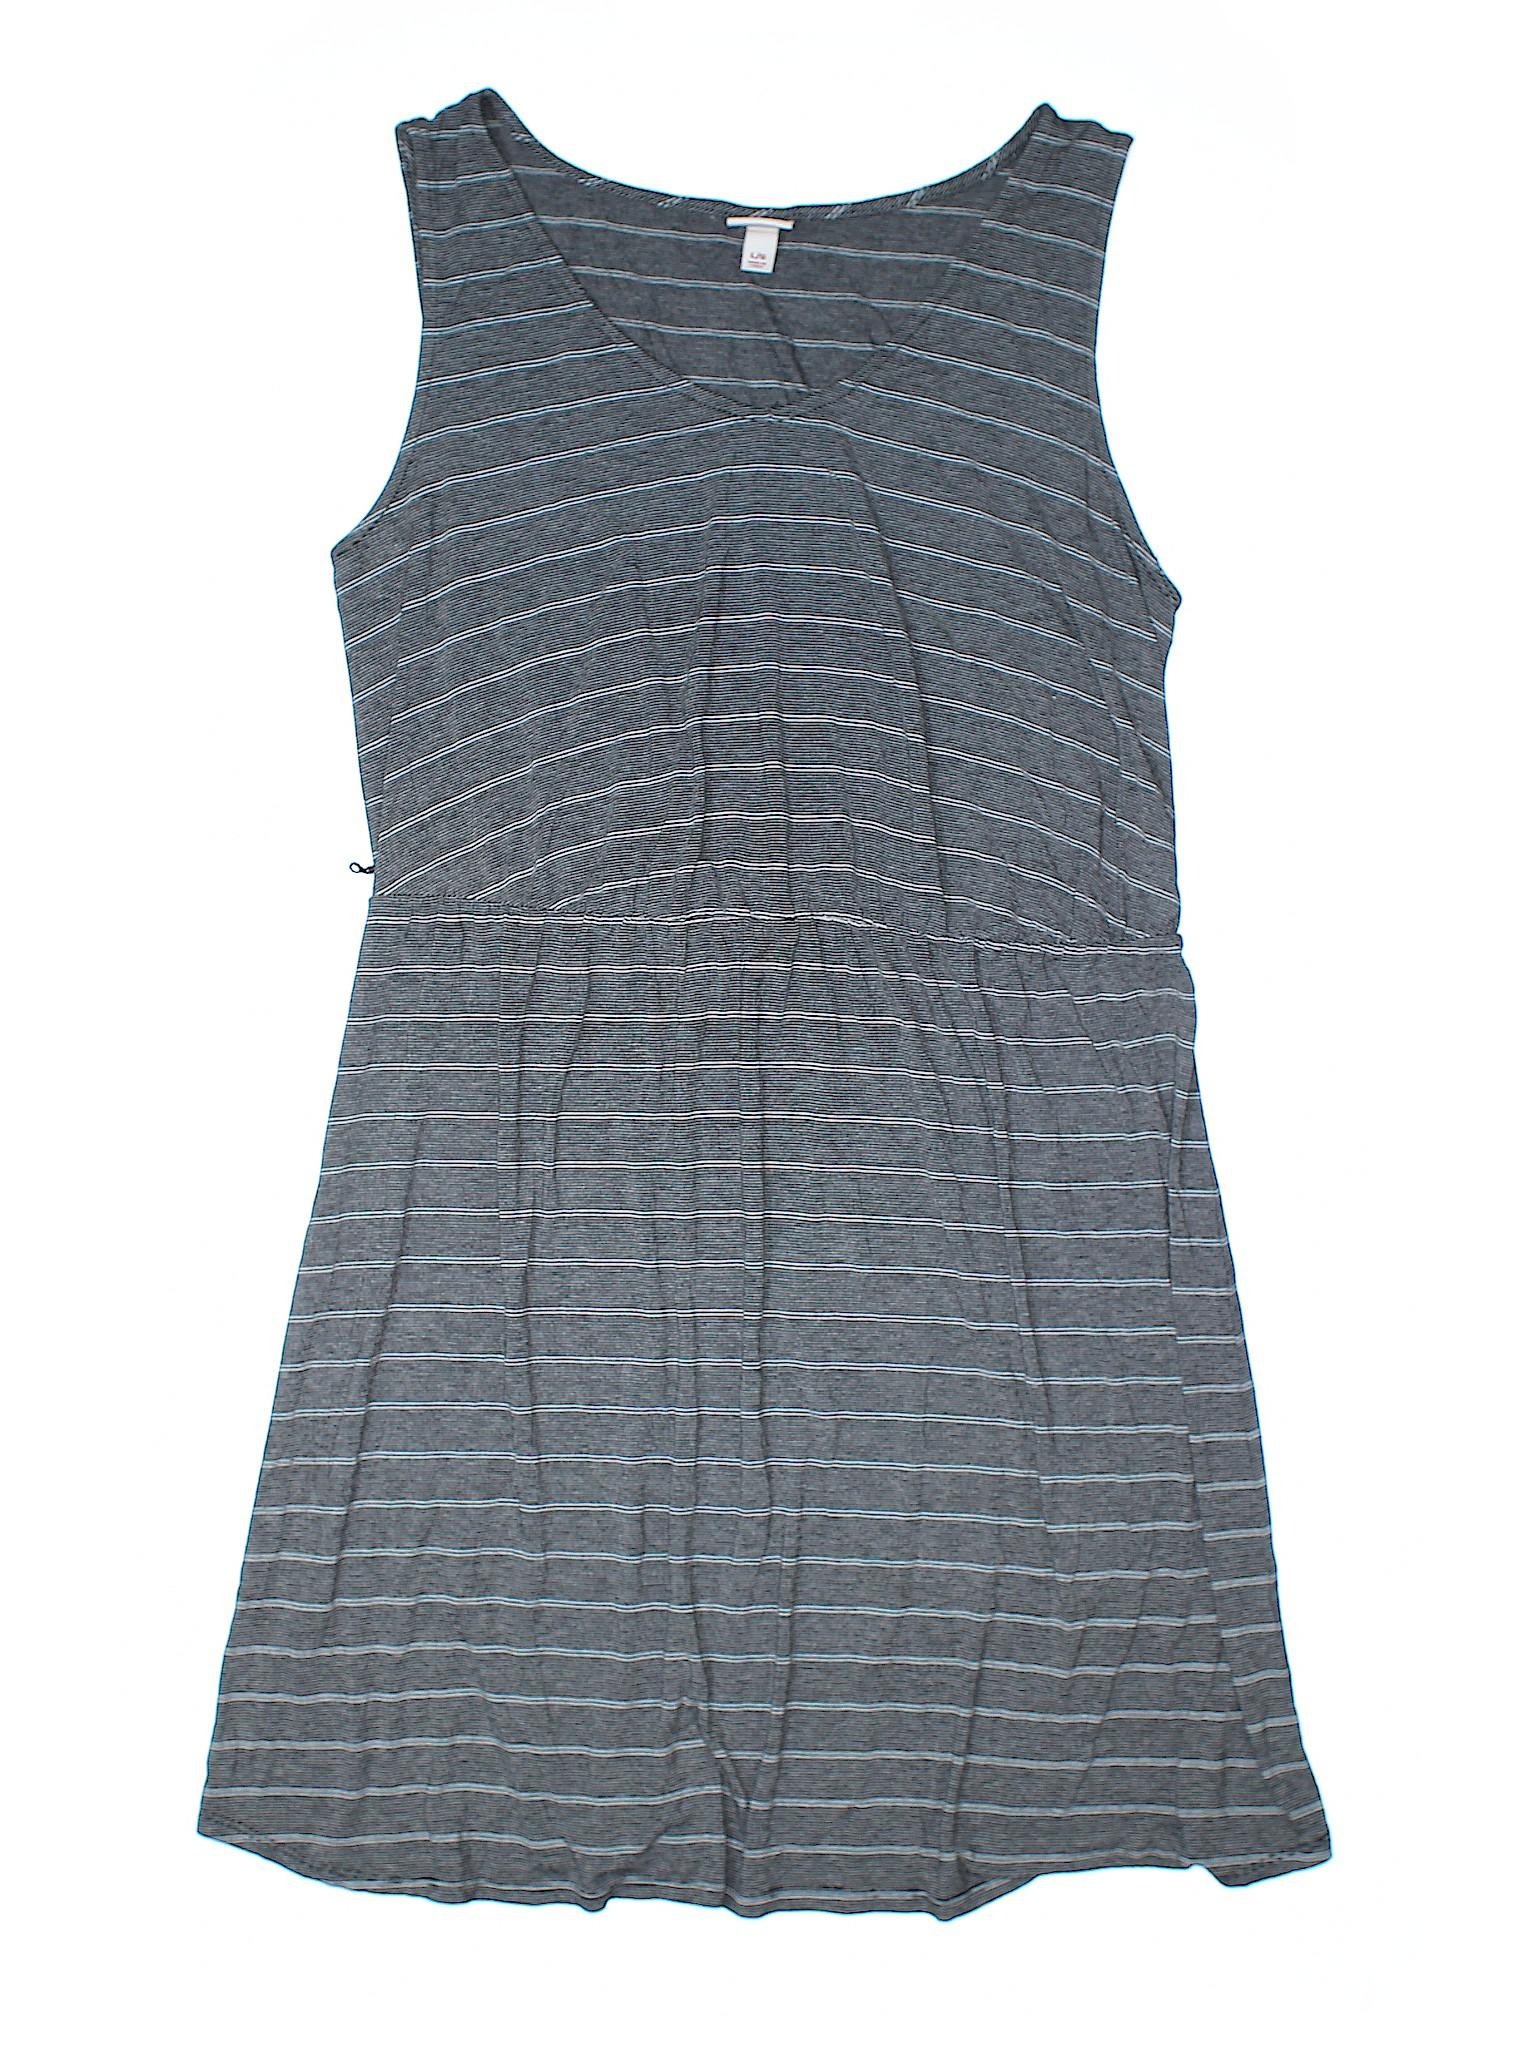 Casual Boutique Winter Dress Merona Boutique Winter 8wSYIxCqC